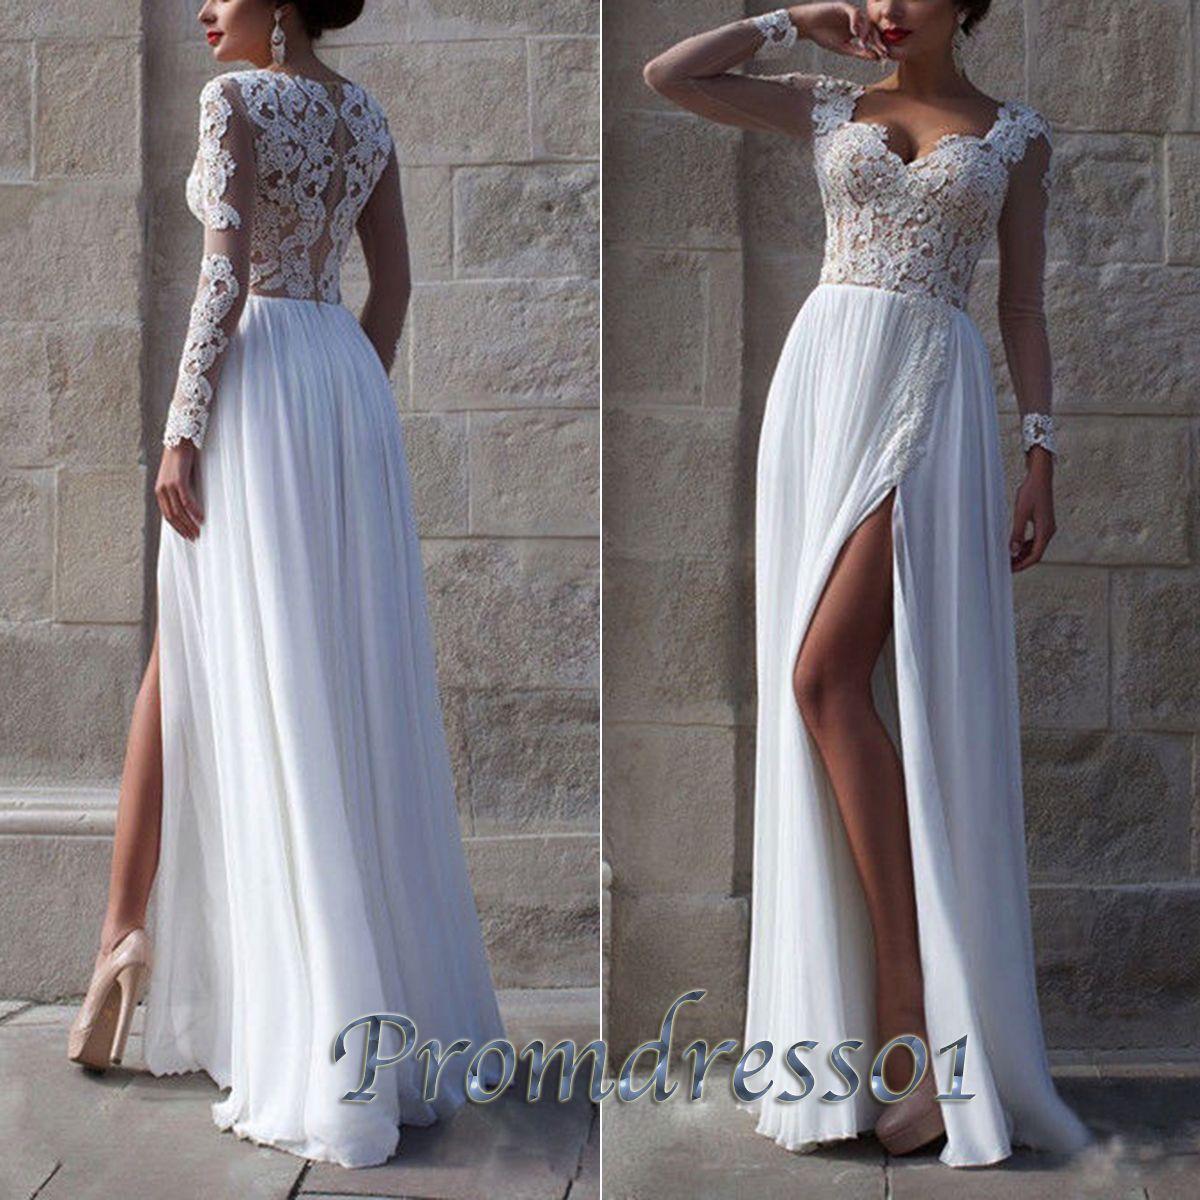 Sexy white chiffon left slit long senior prom dress elegant ball